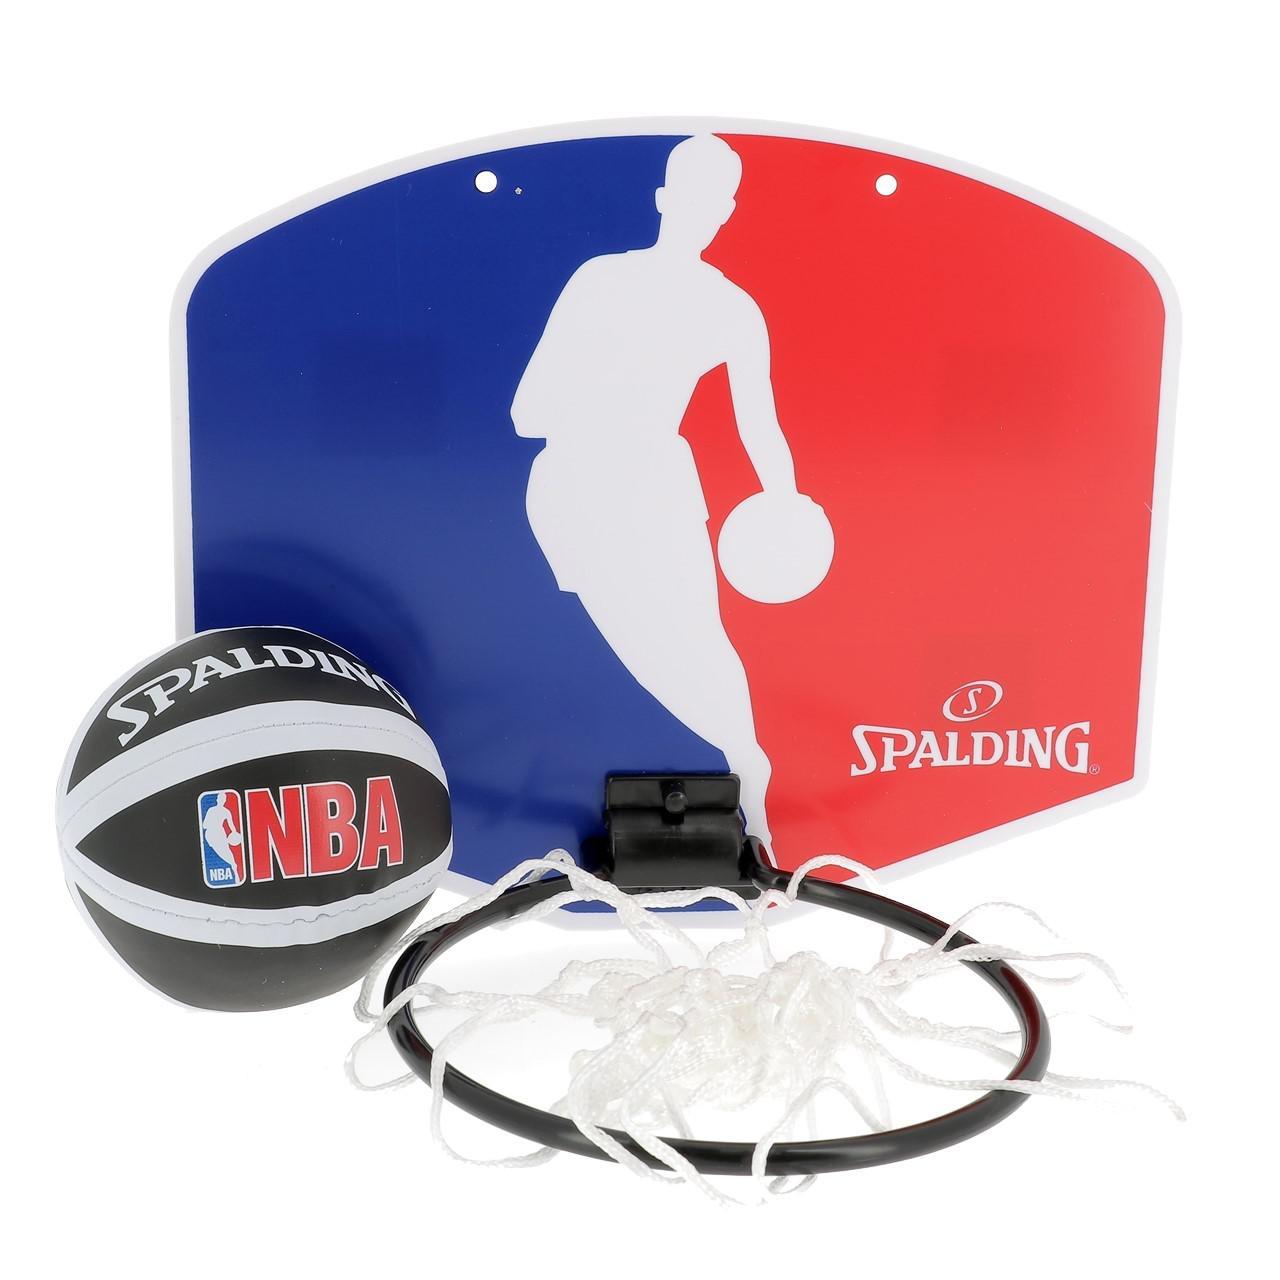 Panel-of-Basketball-Spalding-NBA-Micropanier-Blue-40158-New